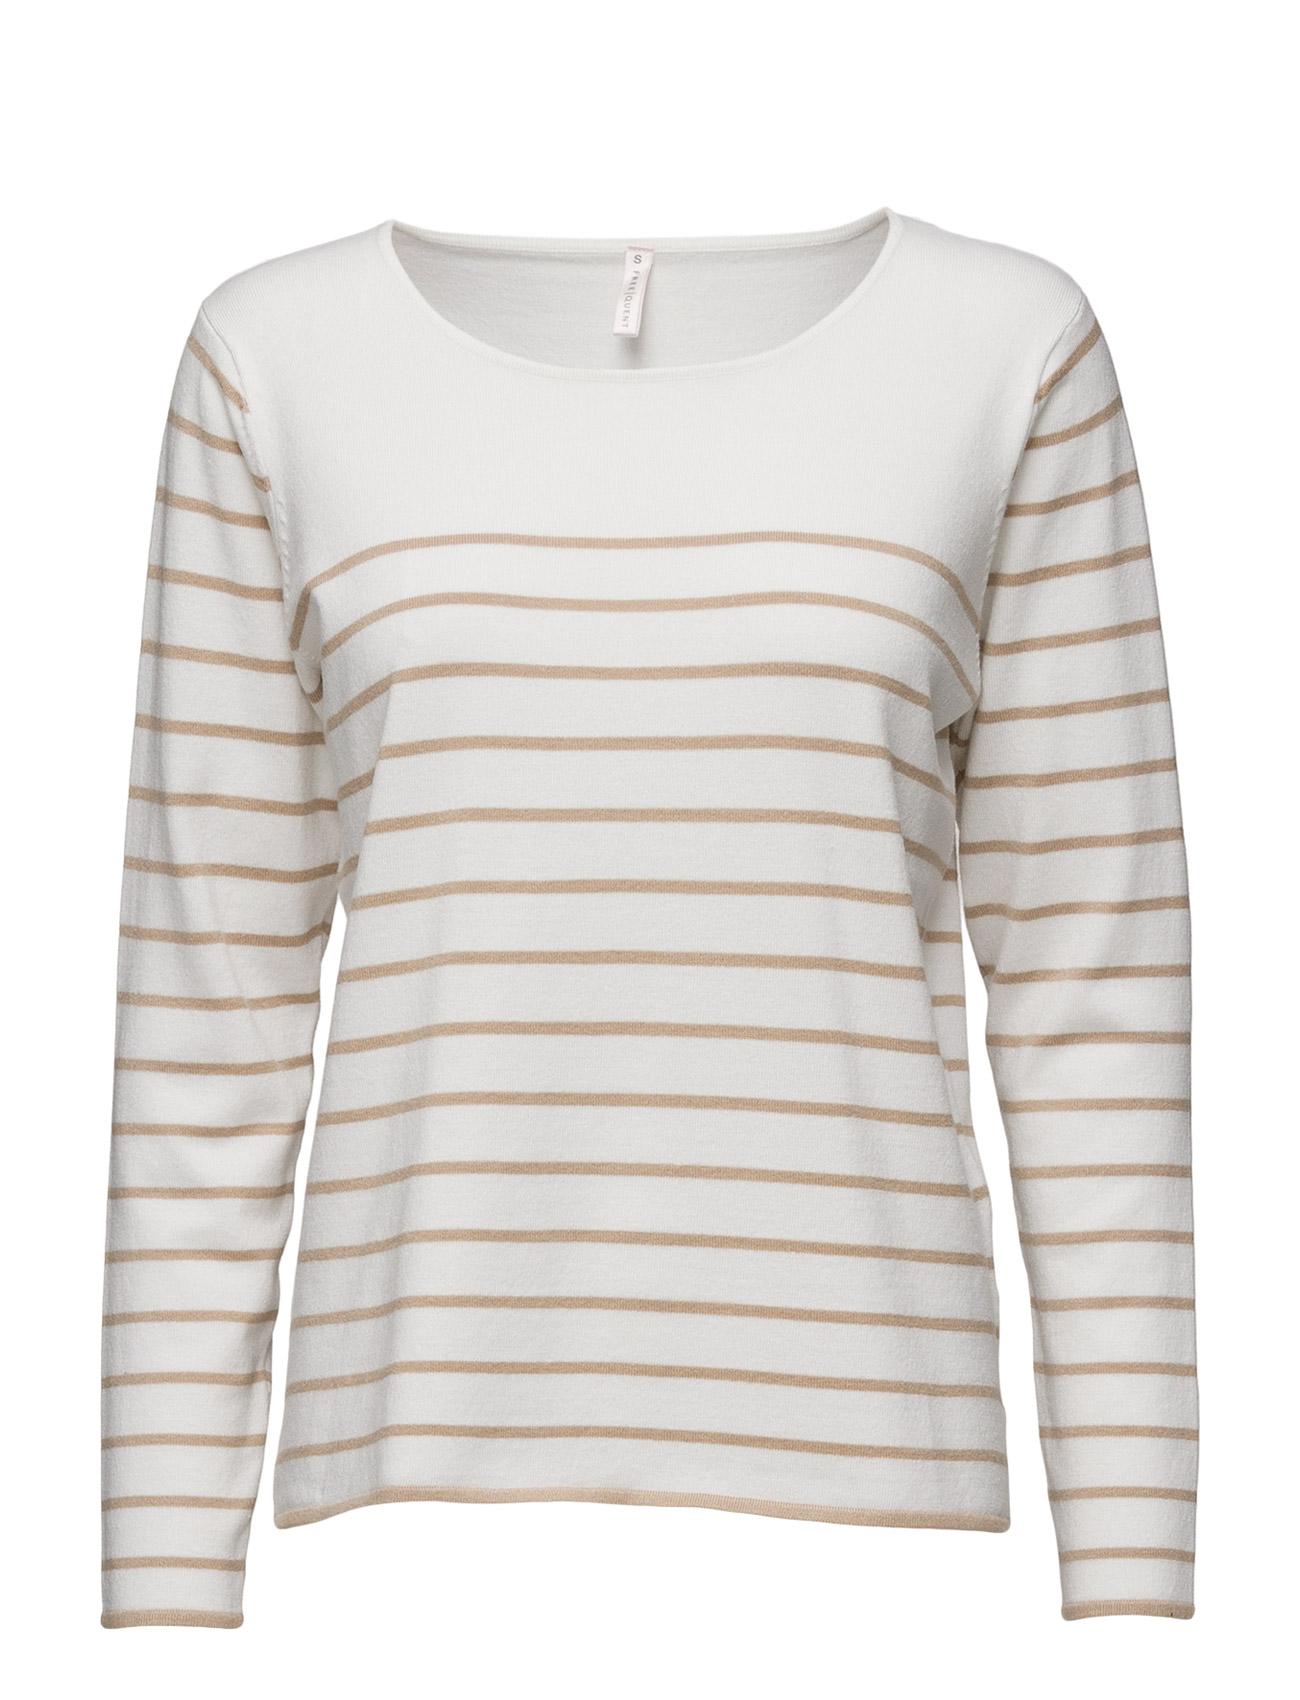 Lio-Pu-Sailor FREE|QUENT Sweatshirts til Damer i